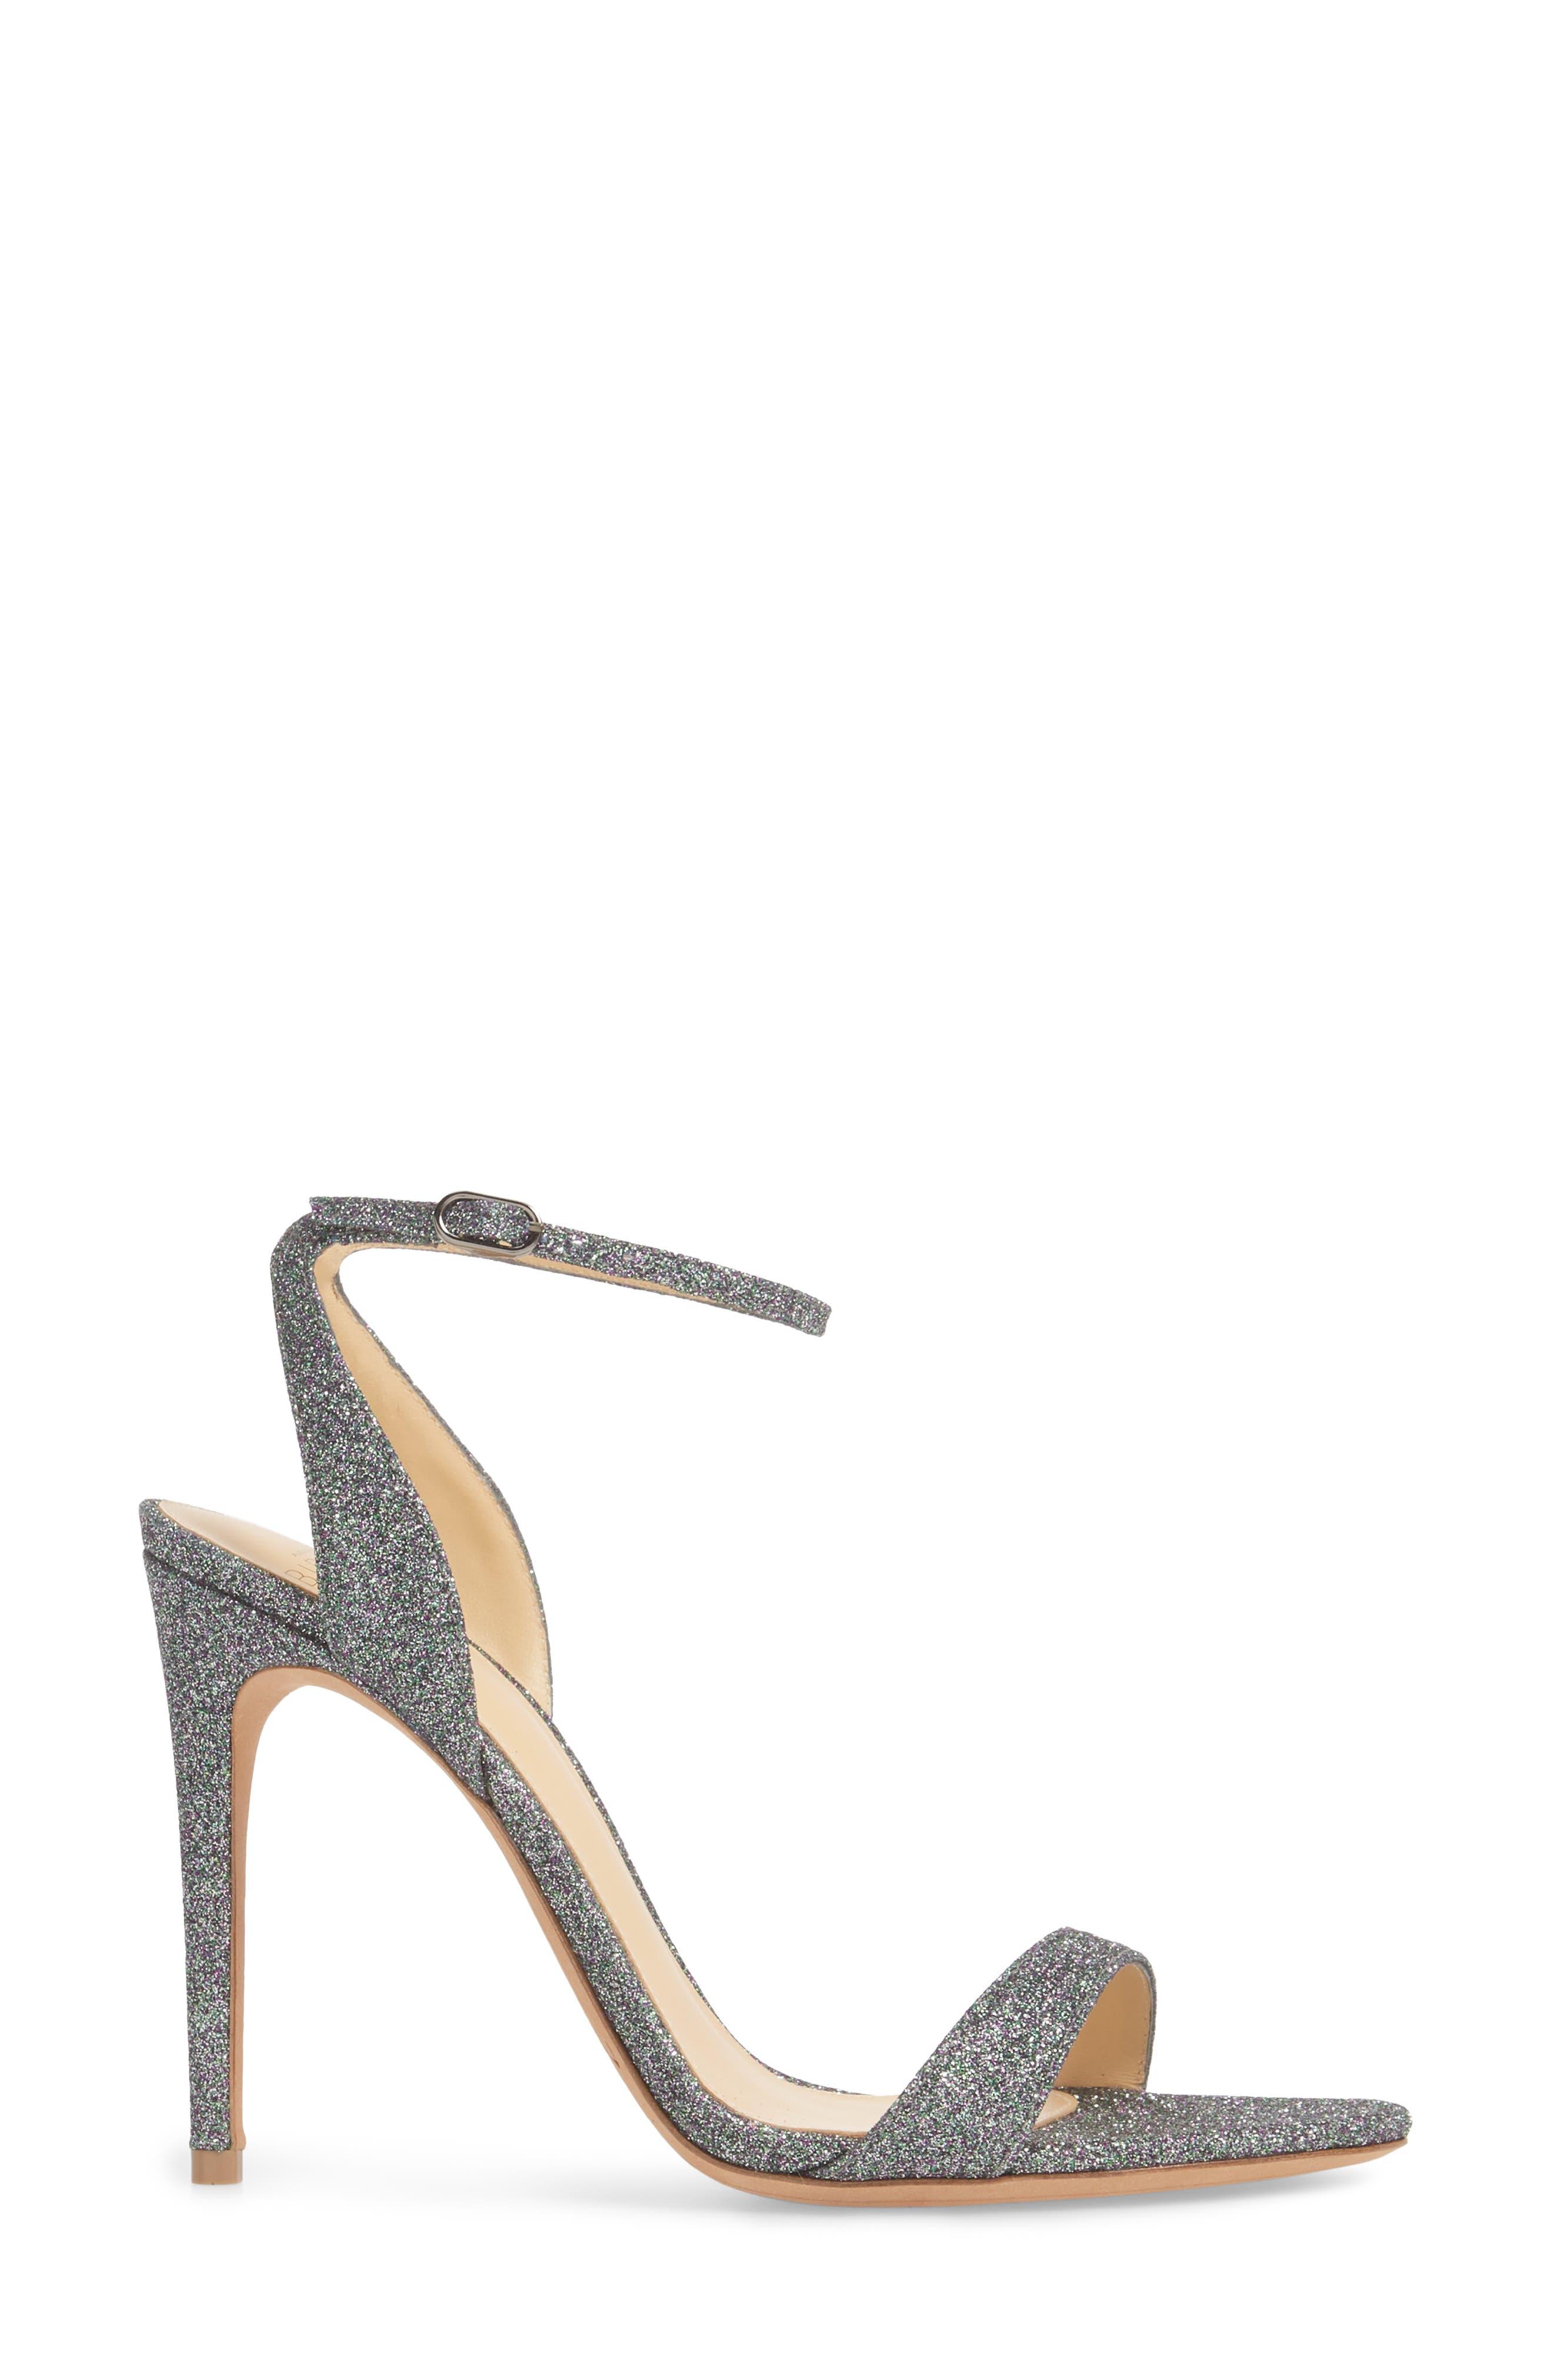 Santine Ankle Strap Sandal,                             Alternate thumbnail 3, color,                             SILVER